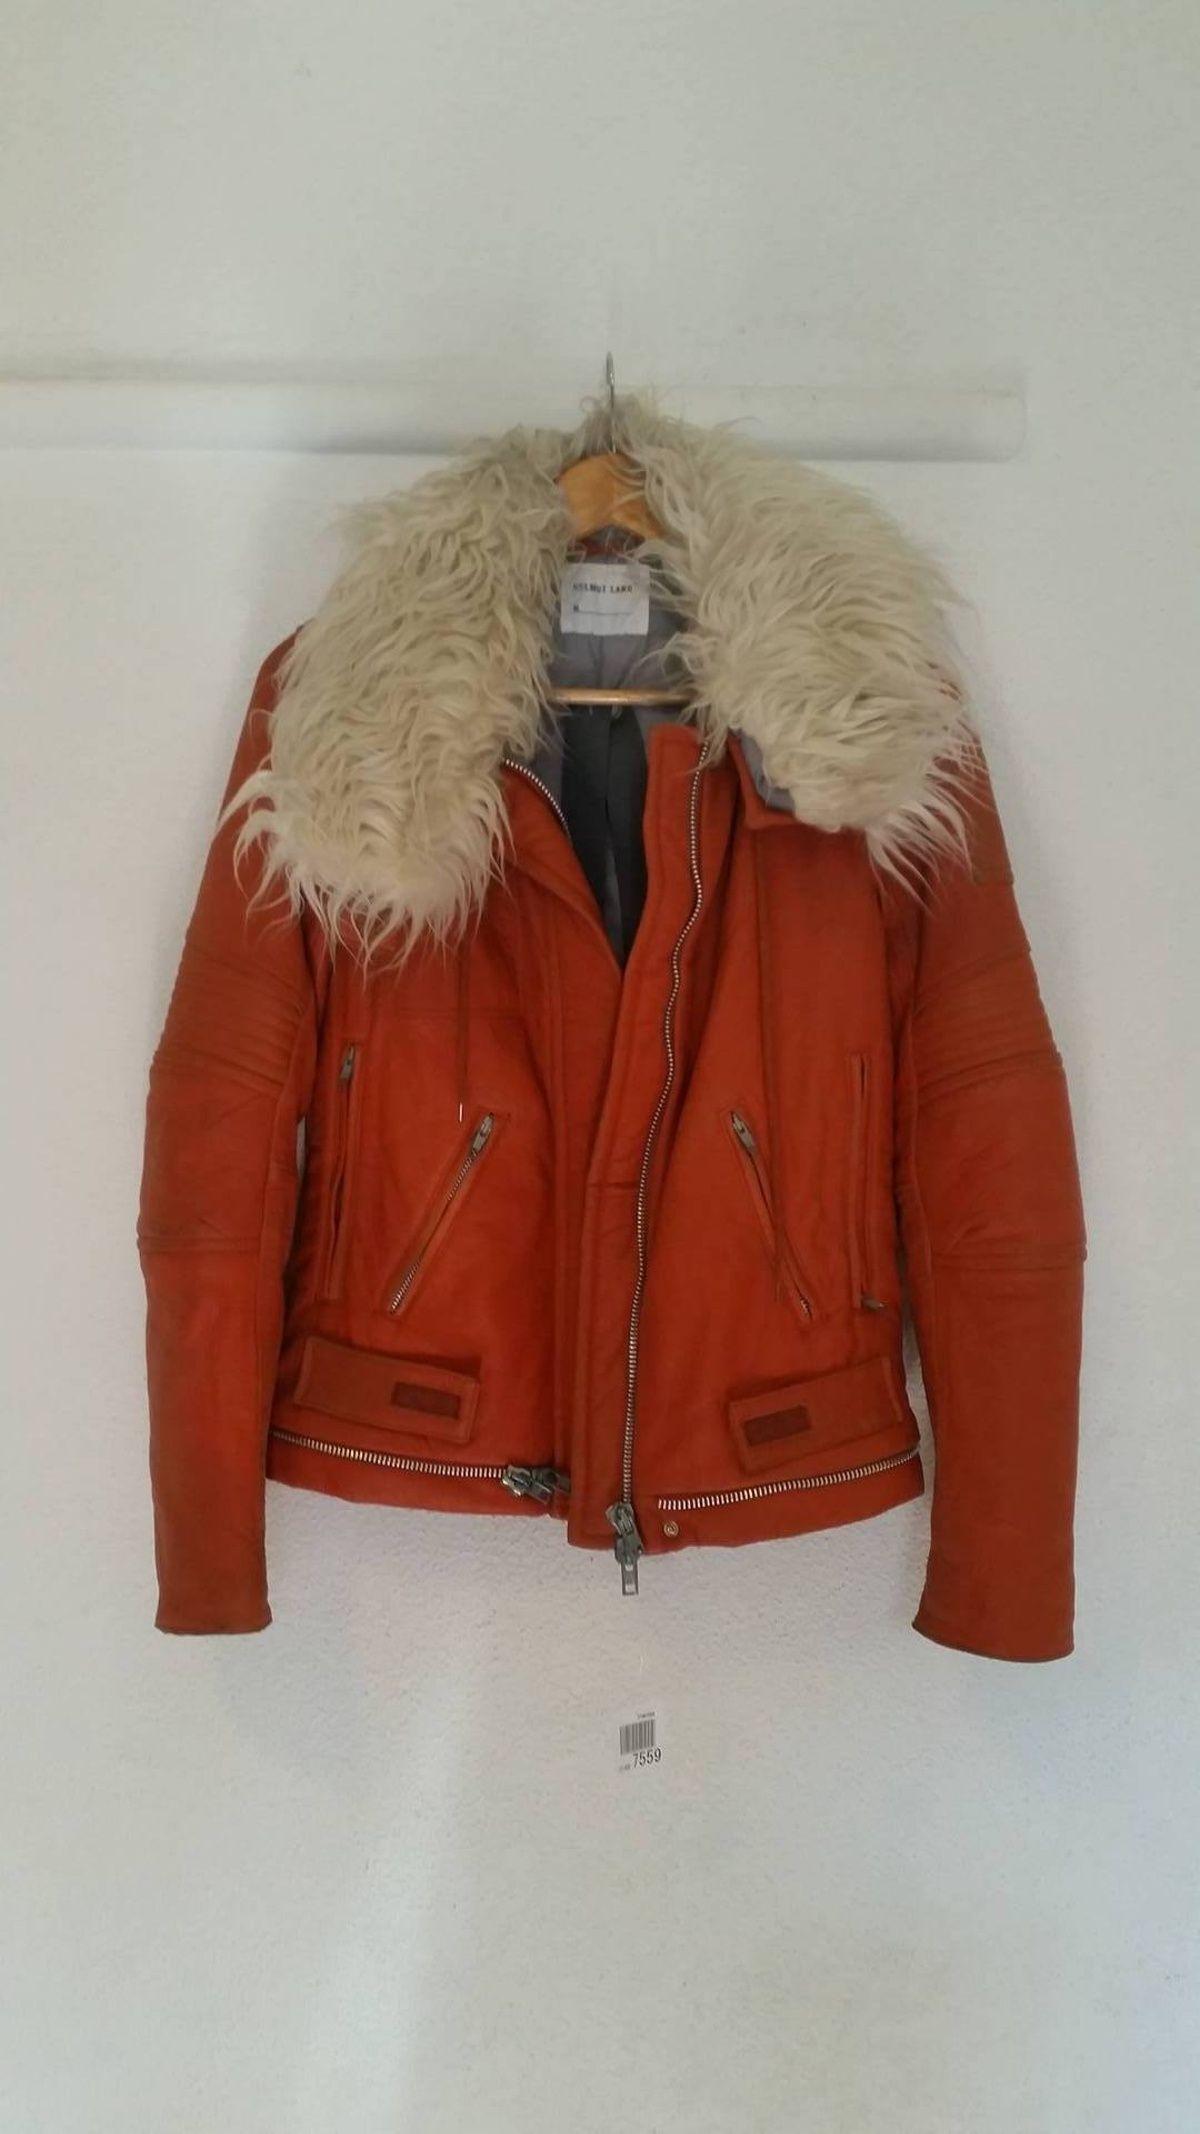 Buy Helmut Lang leather astro biker jacket w/ fur, Size